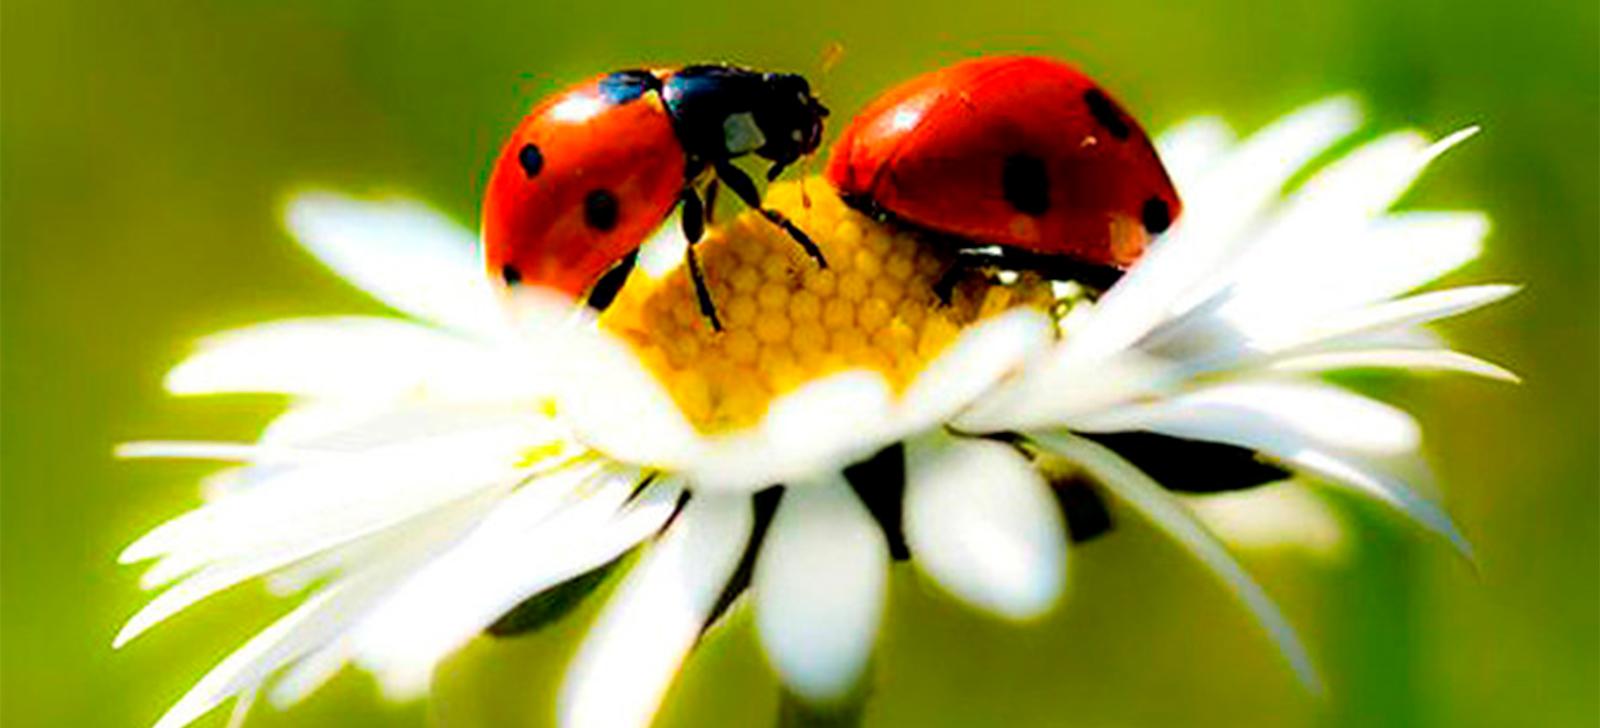 promip manejo integrado de pragas controle biologico paris distribui larvas de joaninha para combater pragas jardins